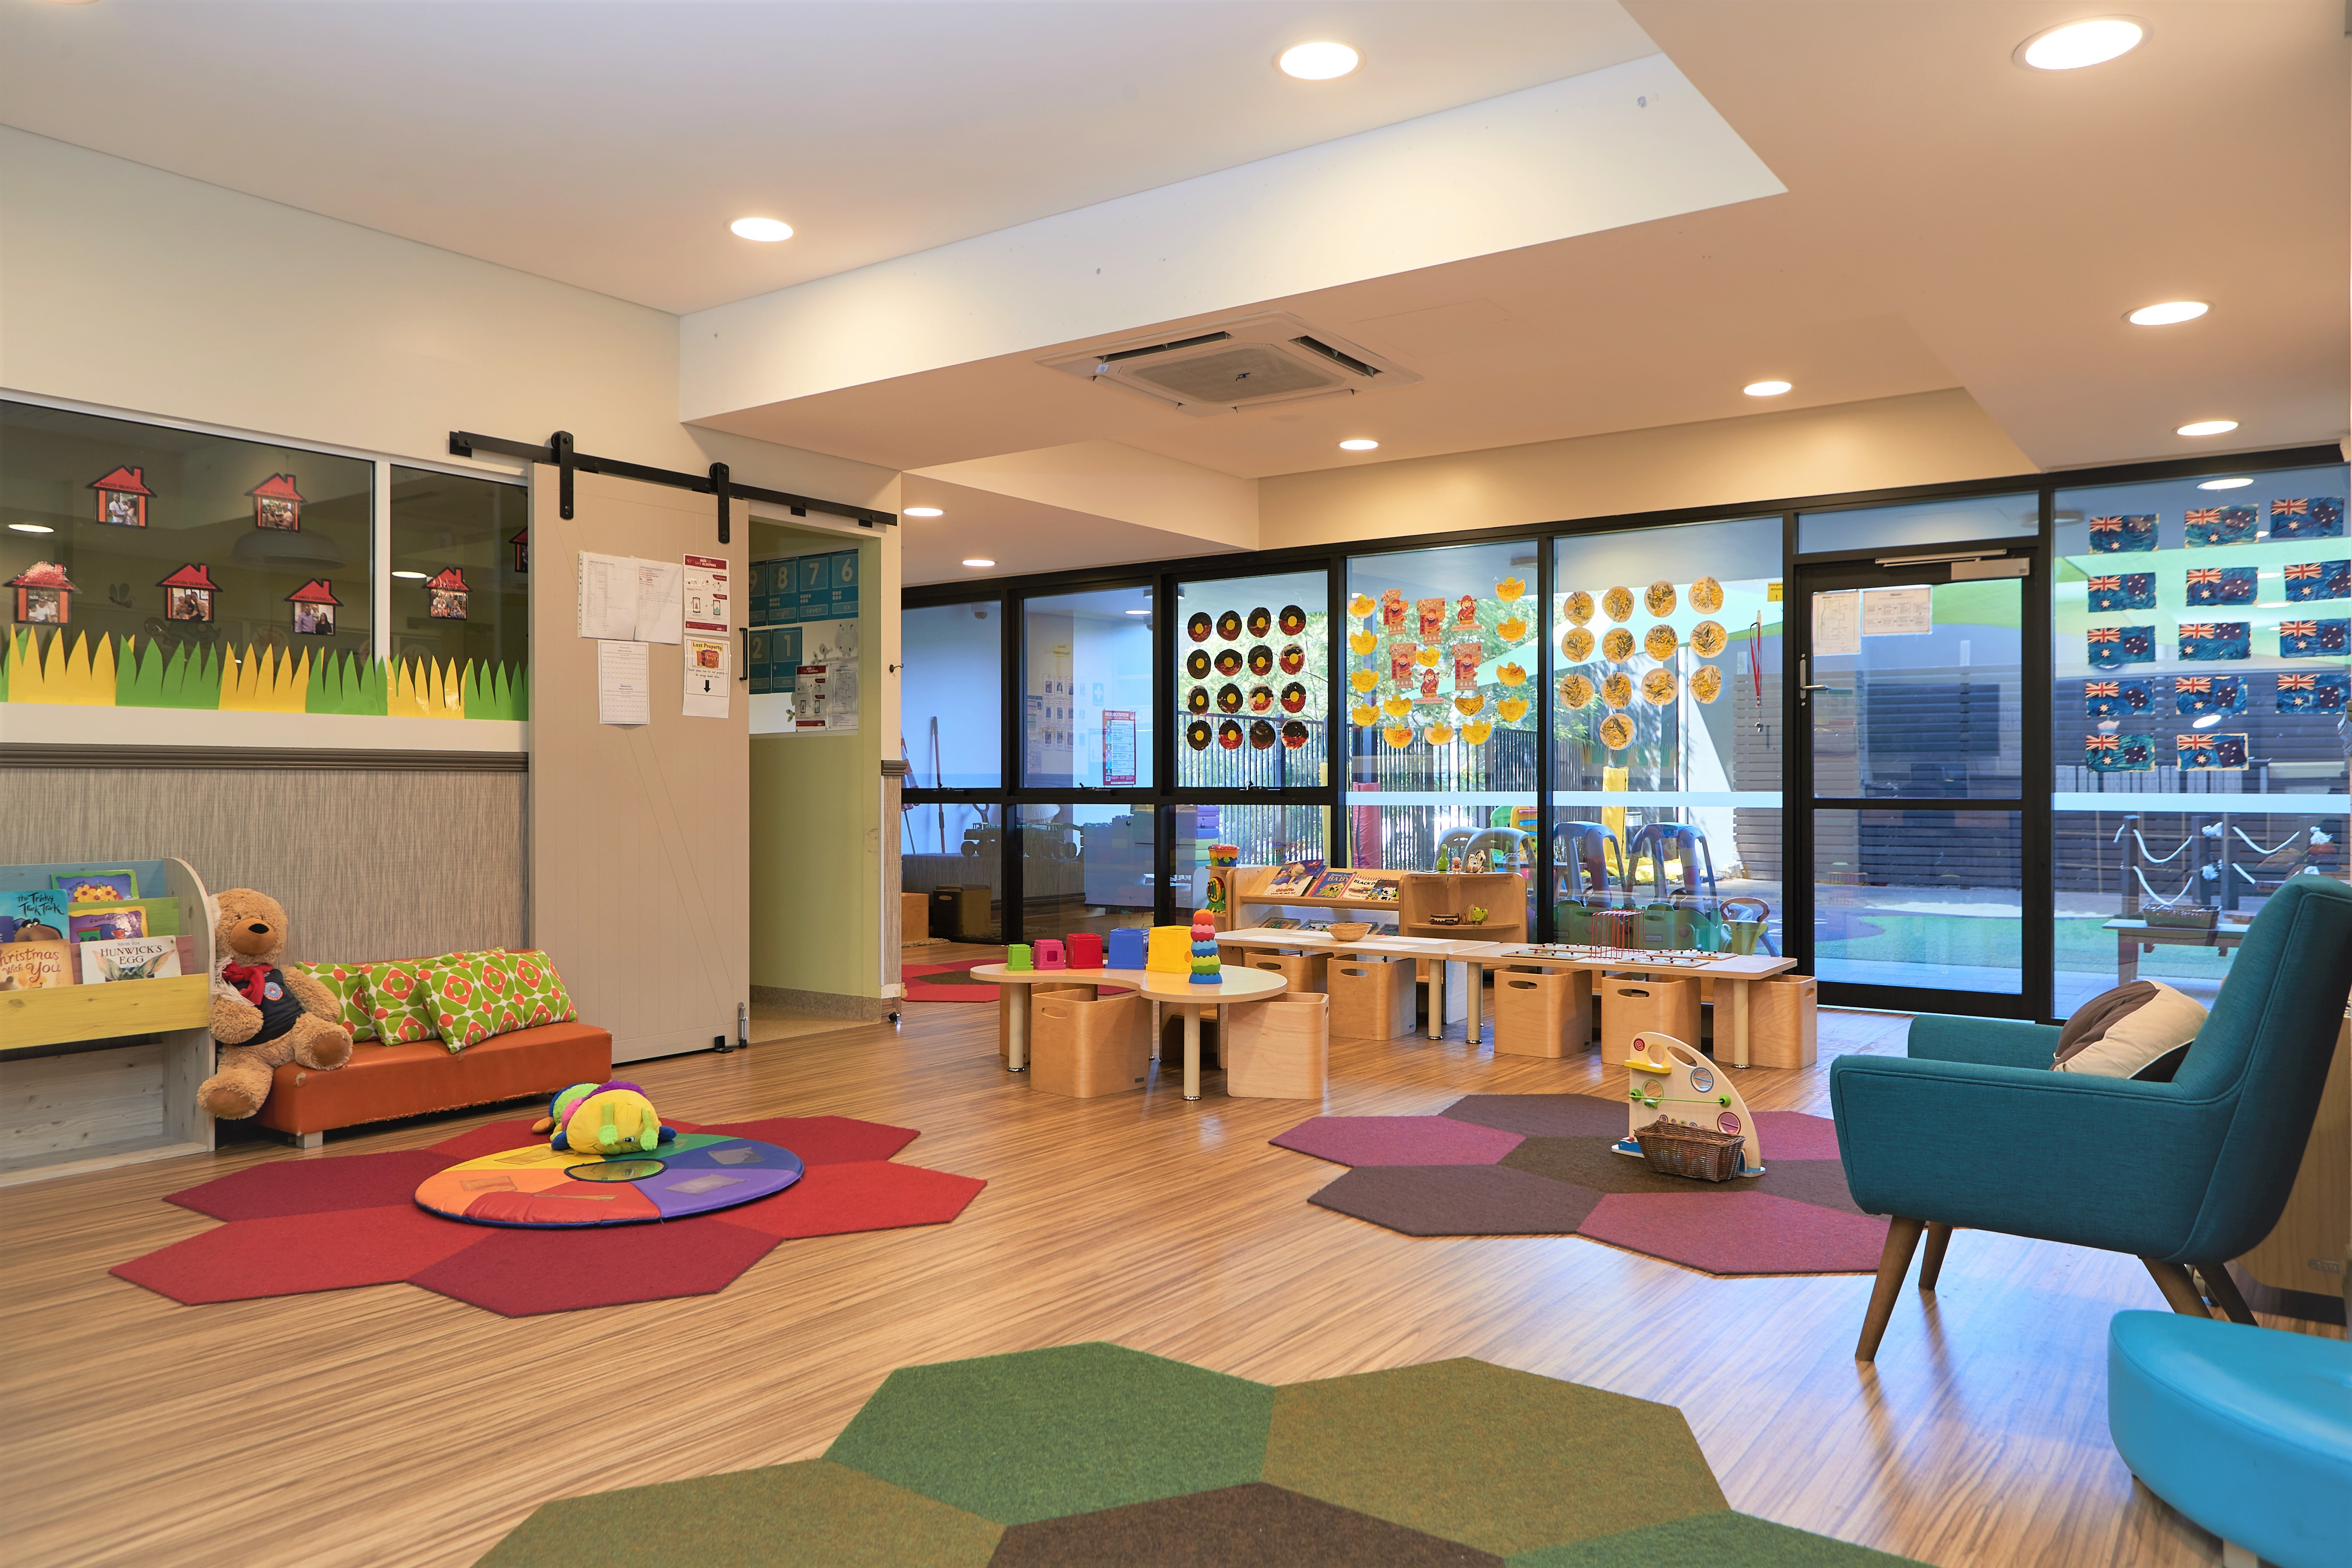 Long day childcare centre alexandria oz education for Childcare centre